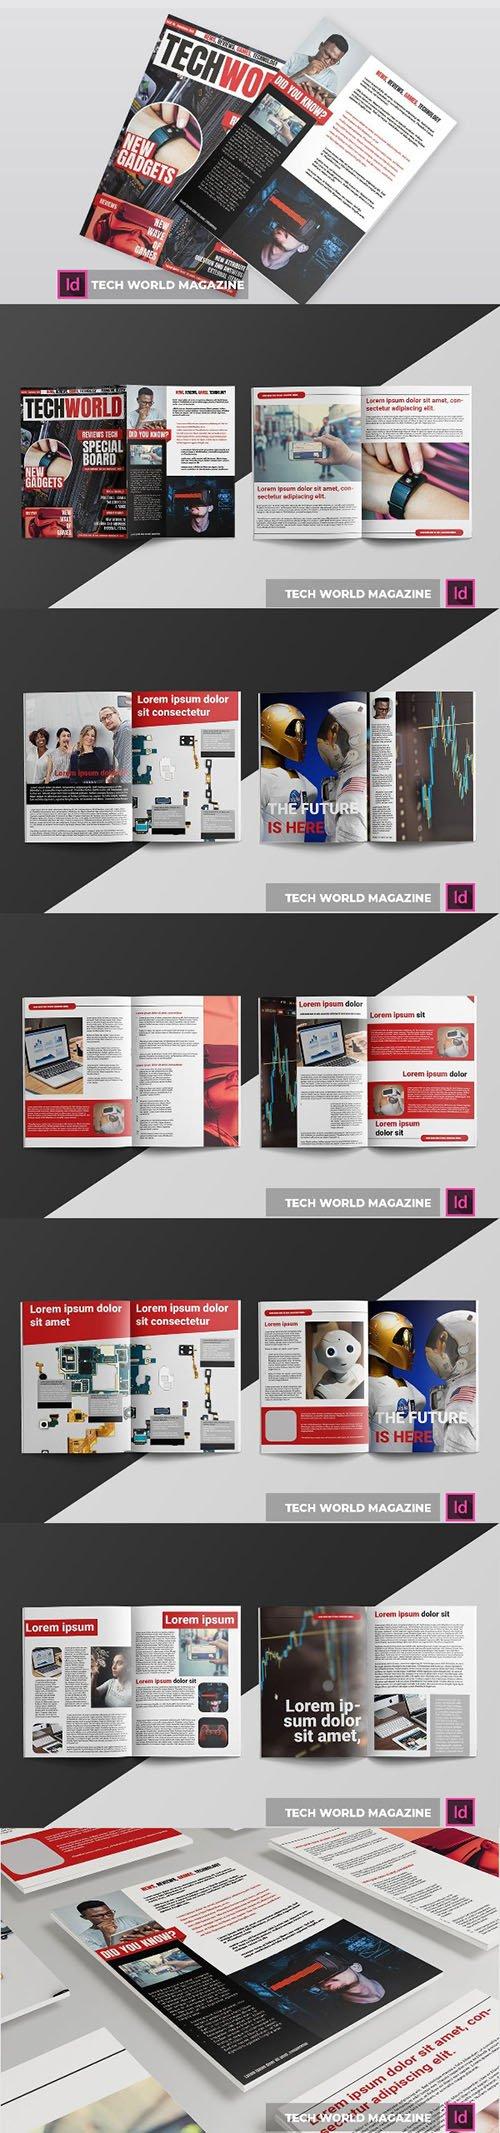 tech world | Magazine Template